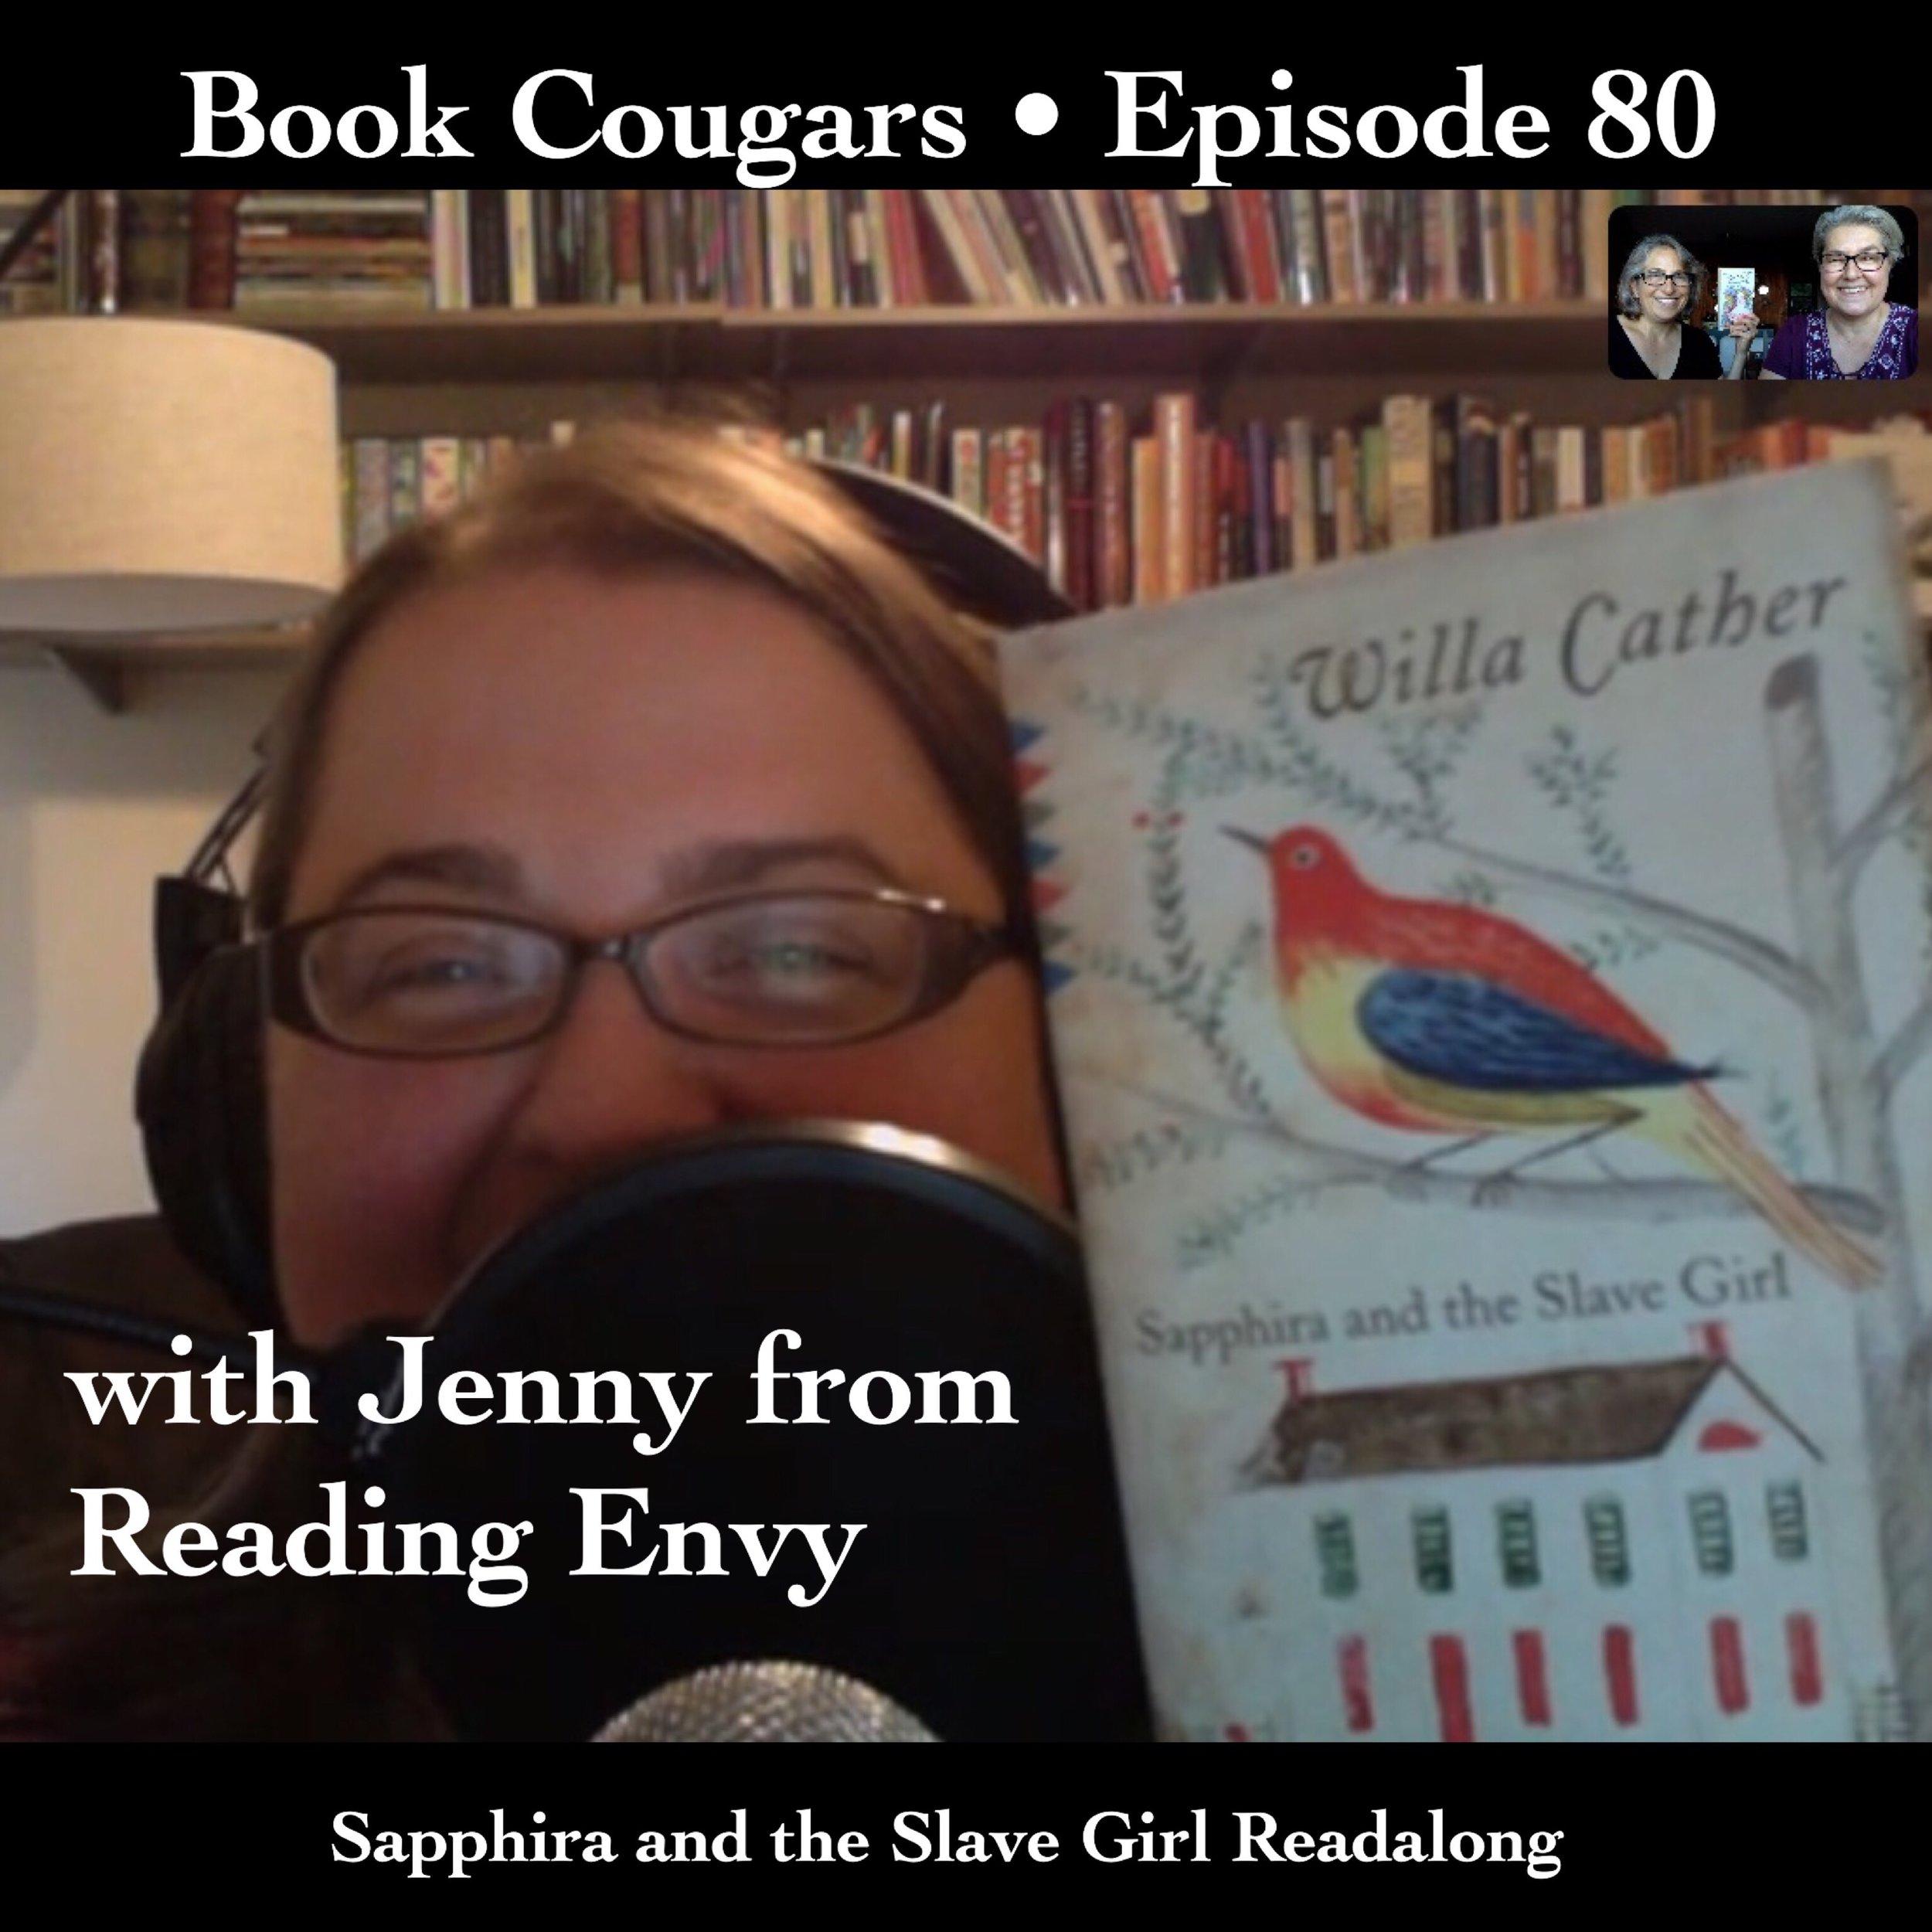 Book Cougars - Episode 80.jpeg